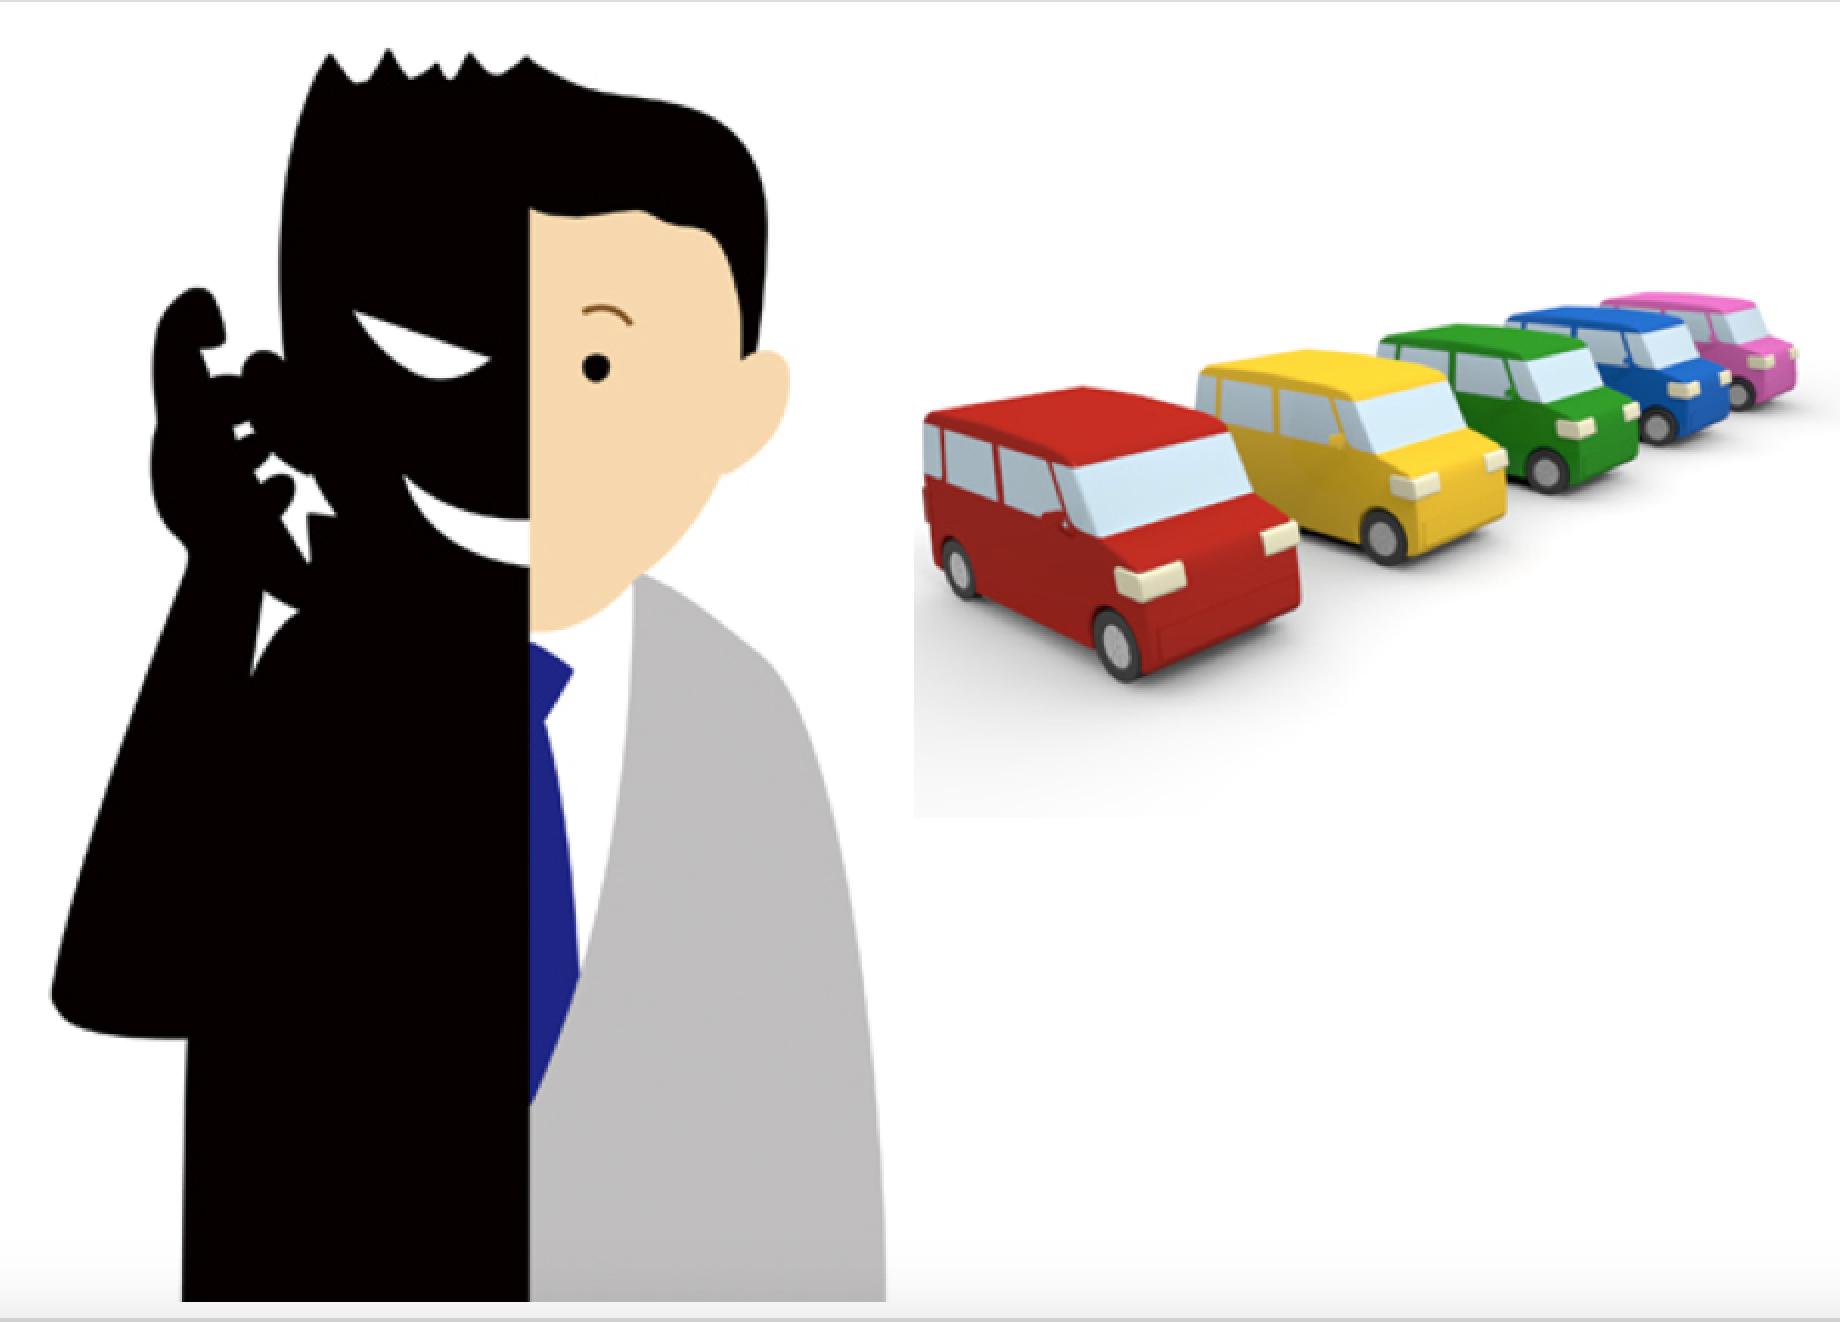 Image of 中古車の「価格表示に注意!」諸費用とは?諸費用一覧あり